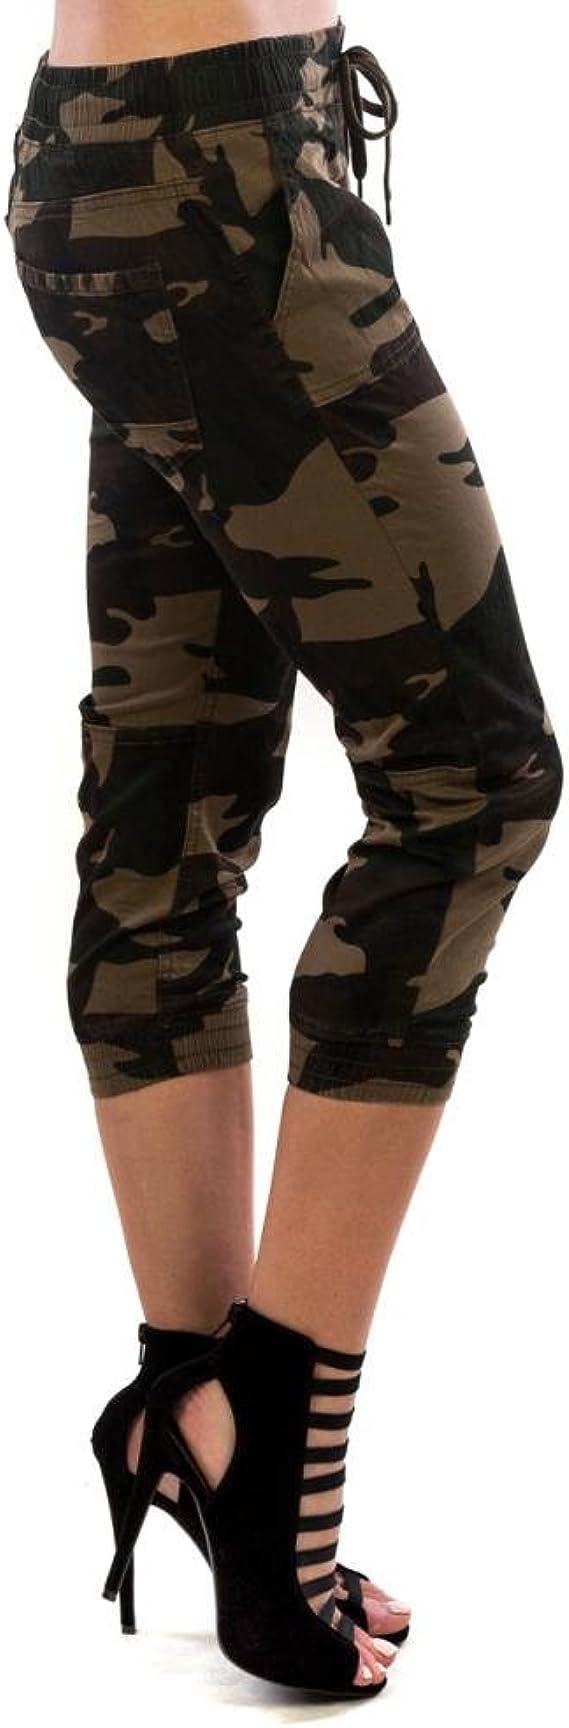 Camouflage Joggers Stretchy Cropped Pants Capri Pants Drawstring Fit 12-16 Khaki